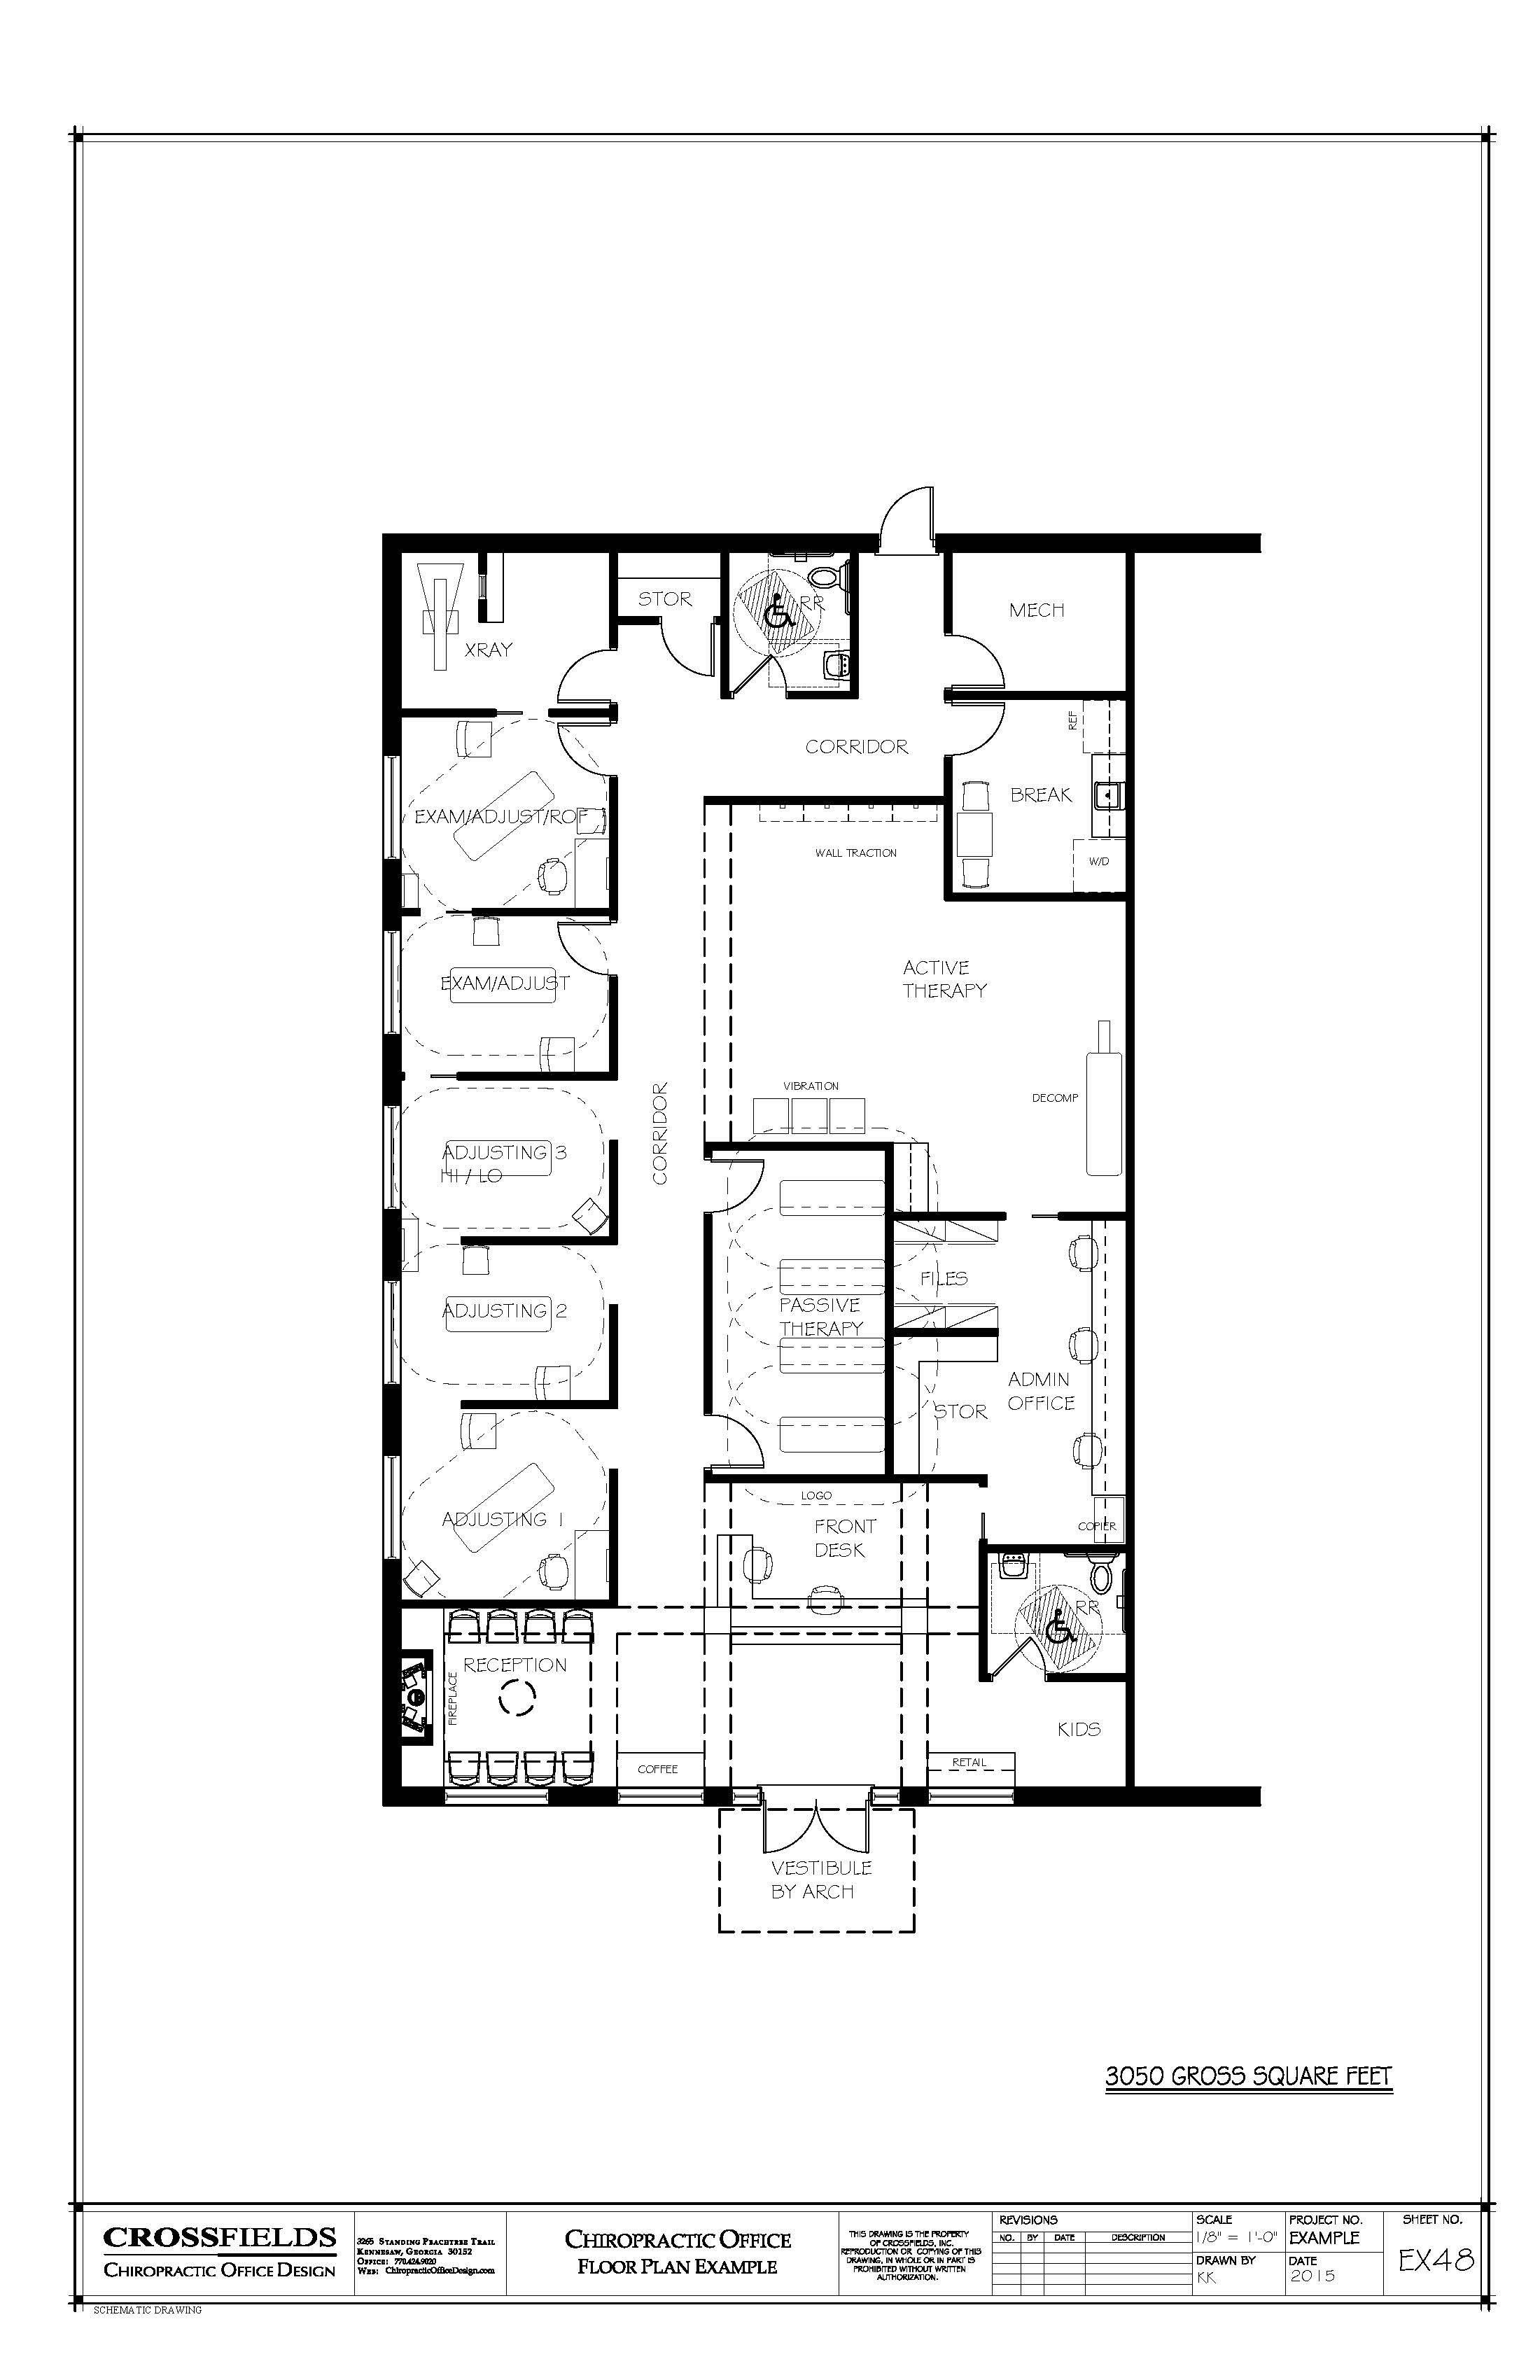 Chiropractic office floorplan with active passive for Office blueprints design